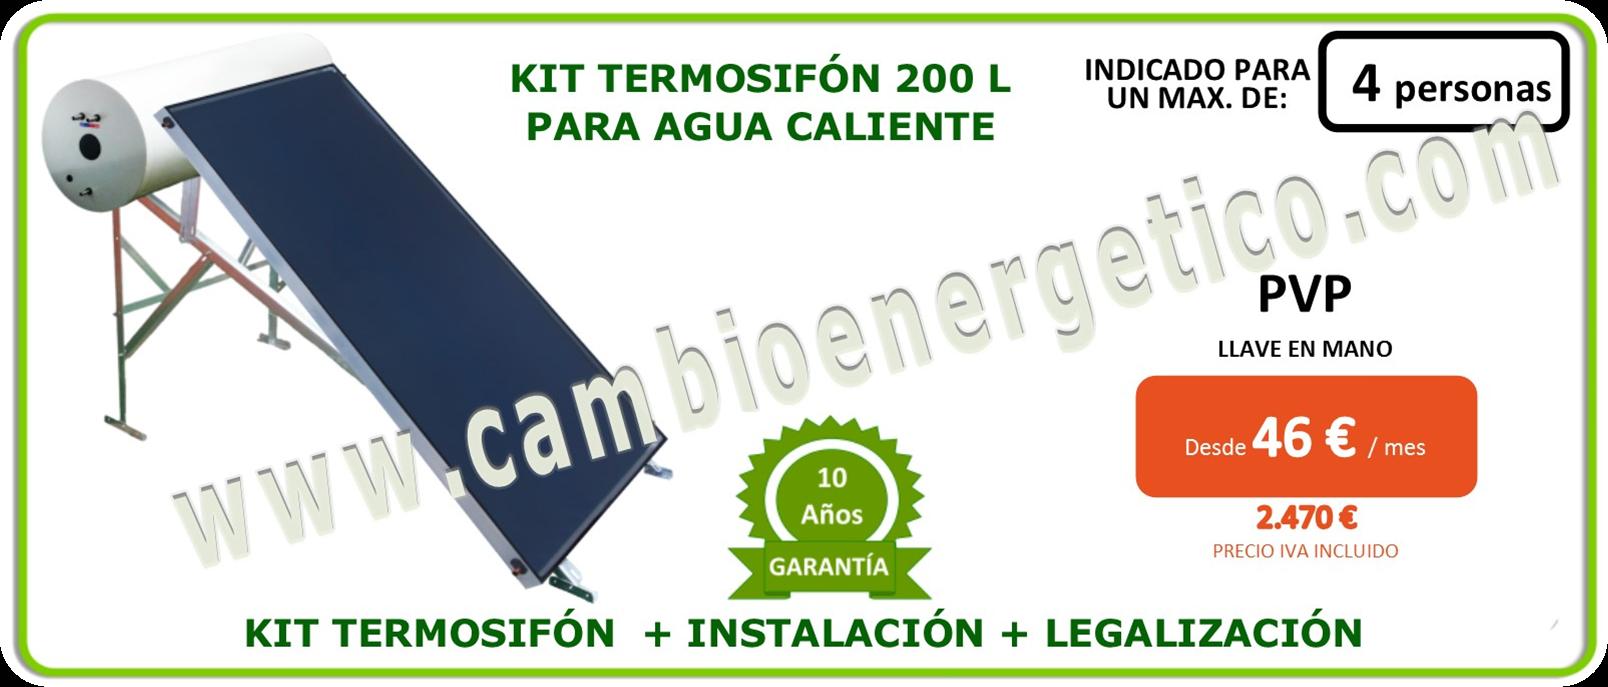 Kit termosifon 200 l